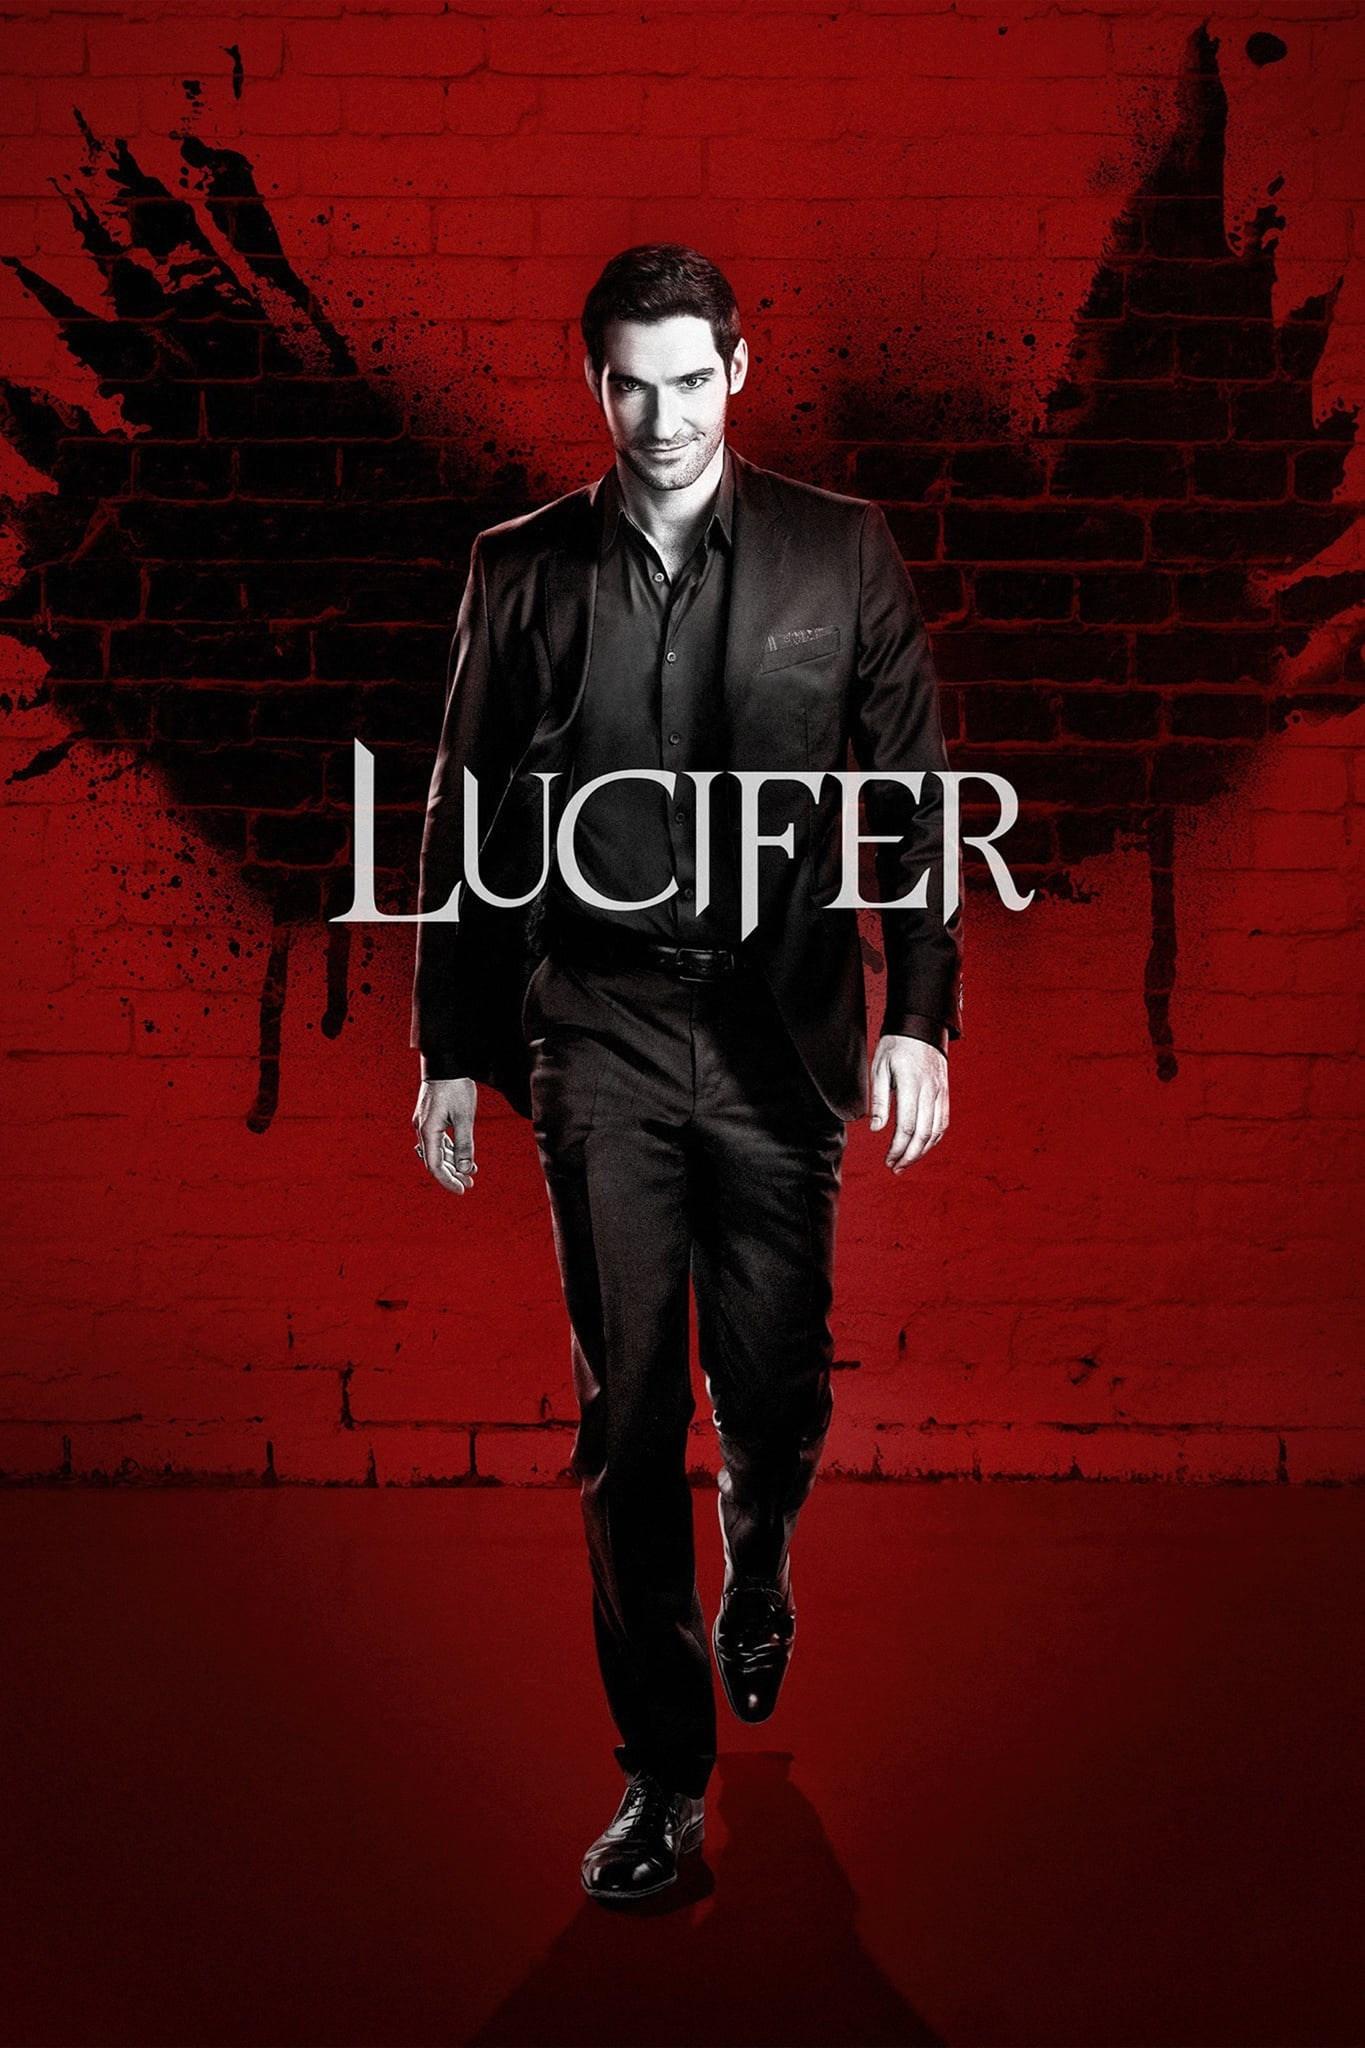 Subscene - Lucifer - First Season Indonesian subtitle